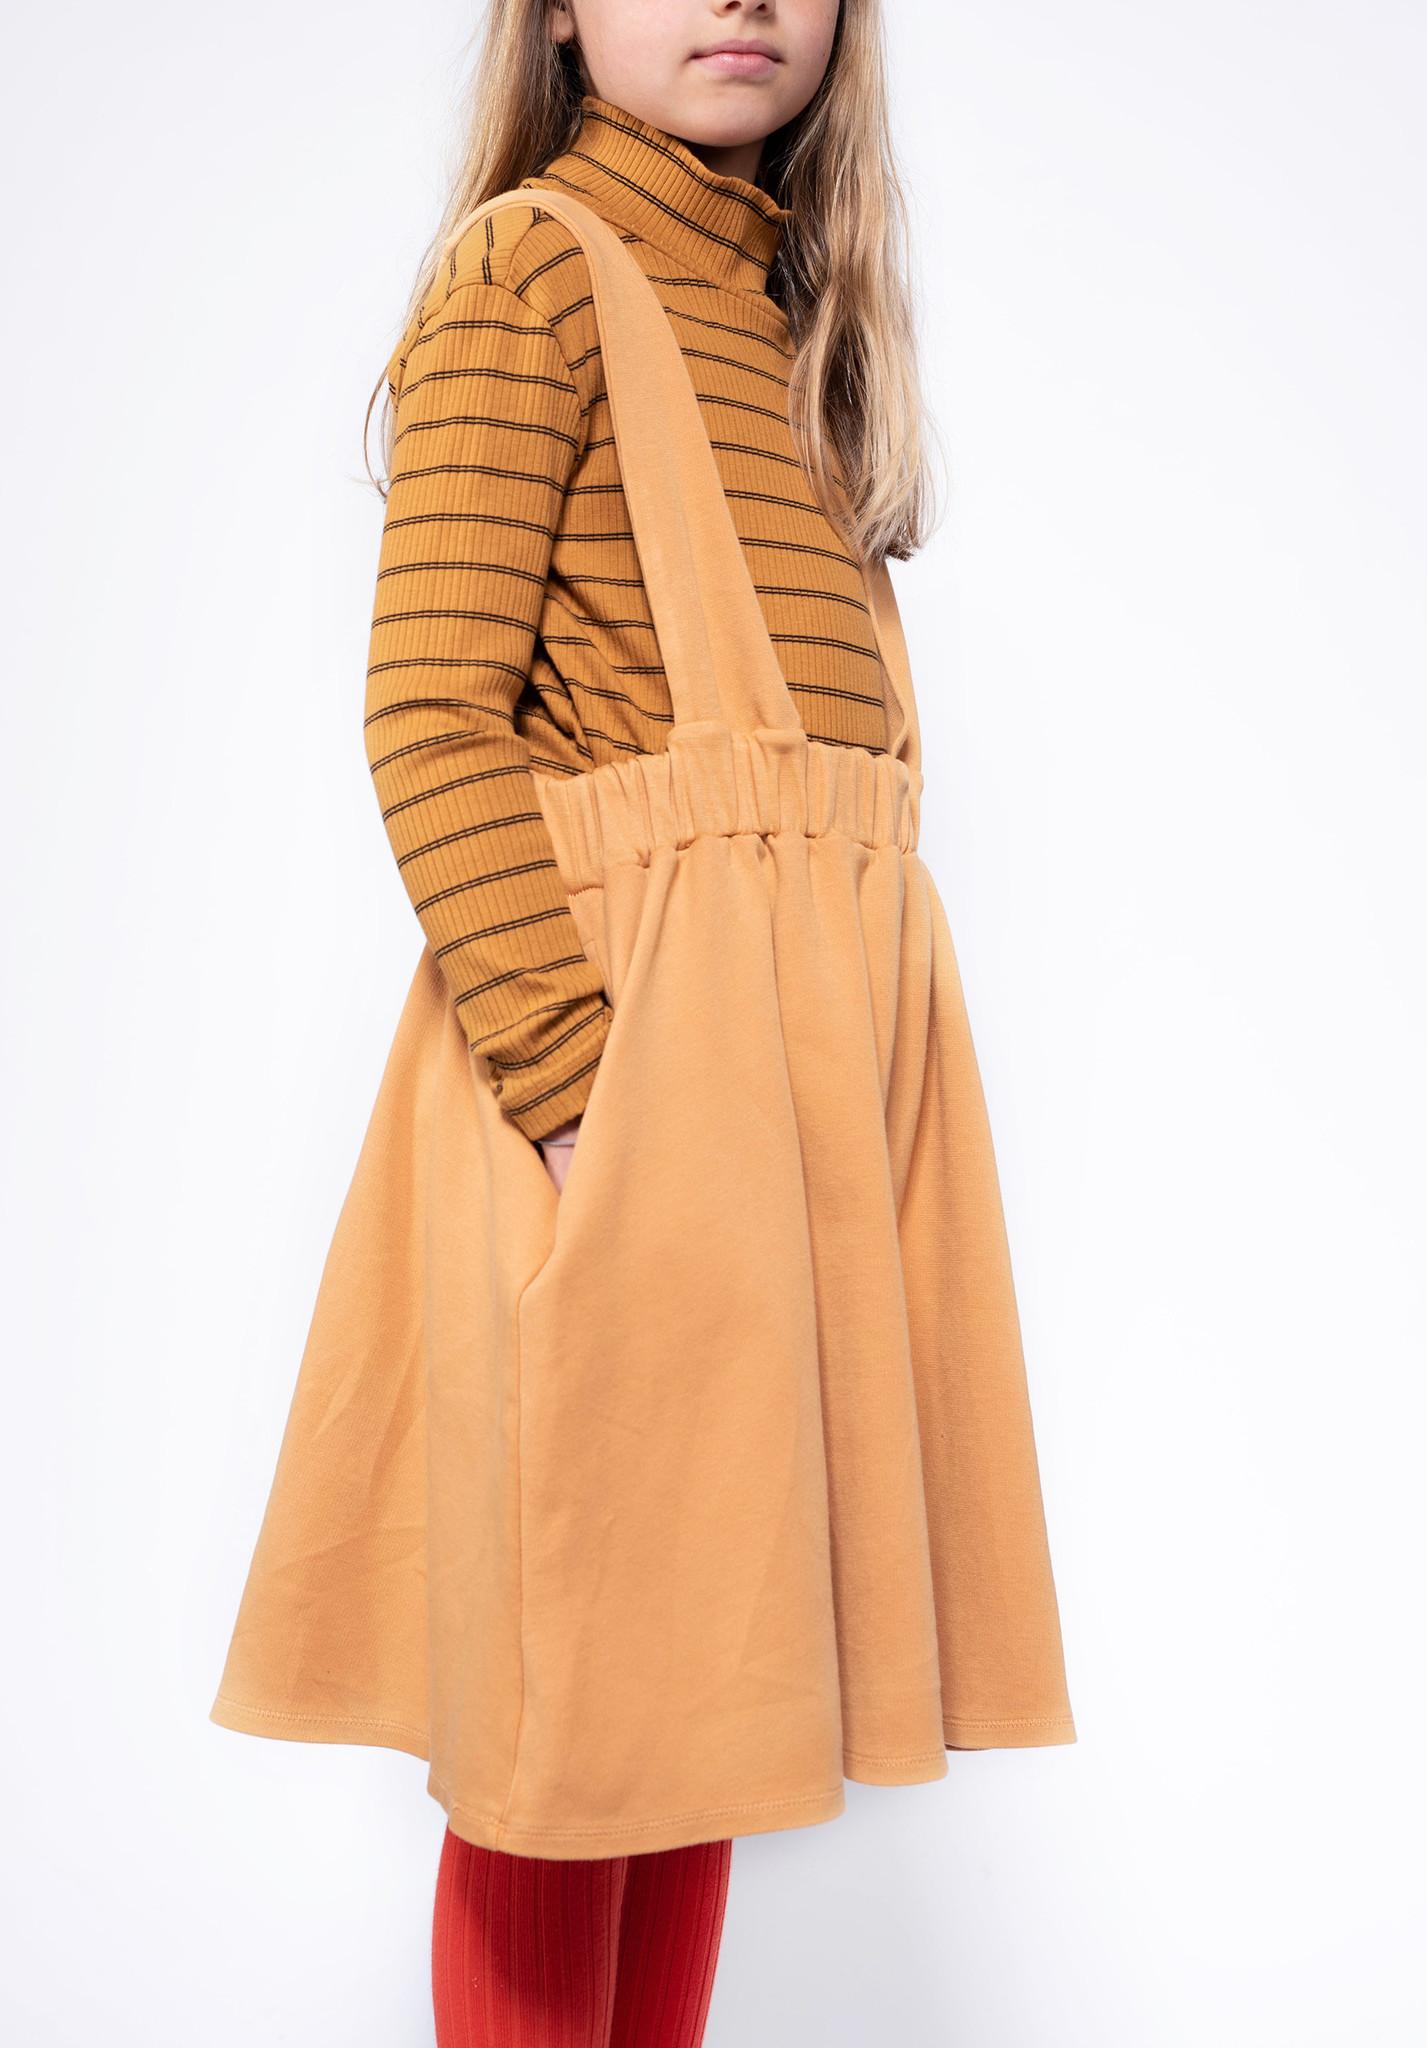 Easy skirt - Warm Powder-2